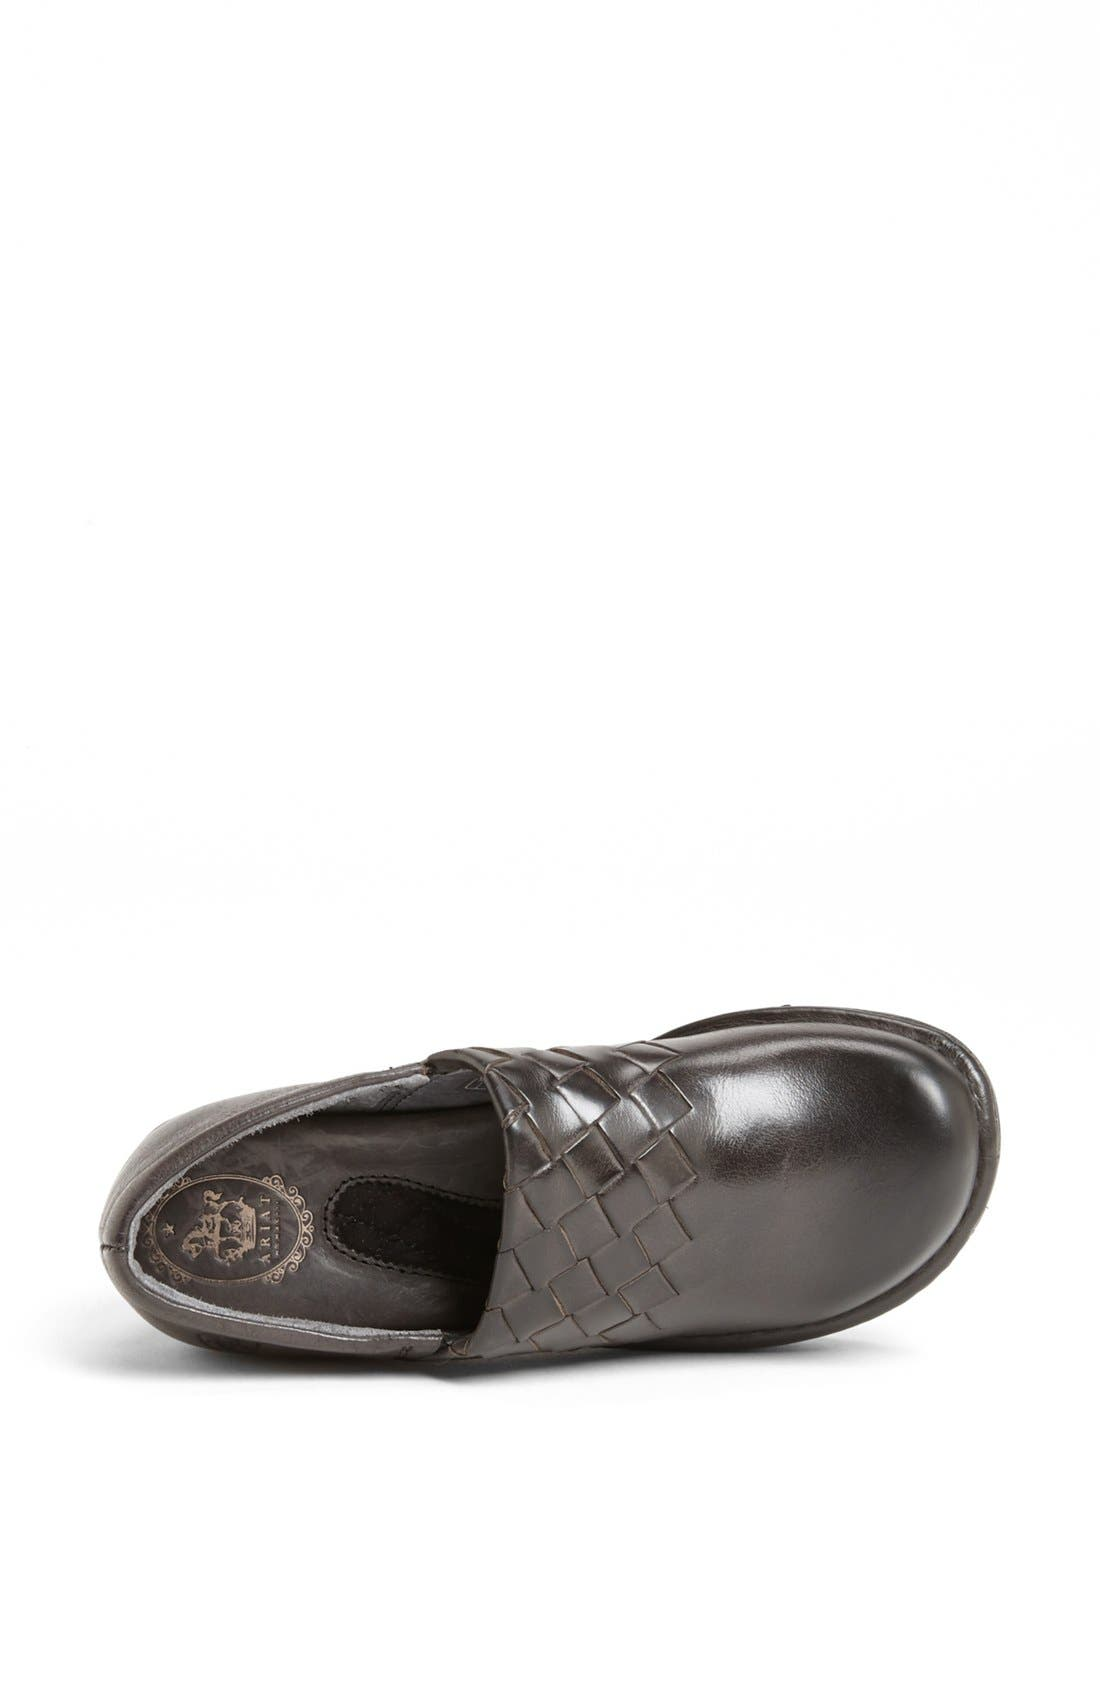 Alternate Image 3  - Ariat 'Ashbourne' Woven Leather Clog